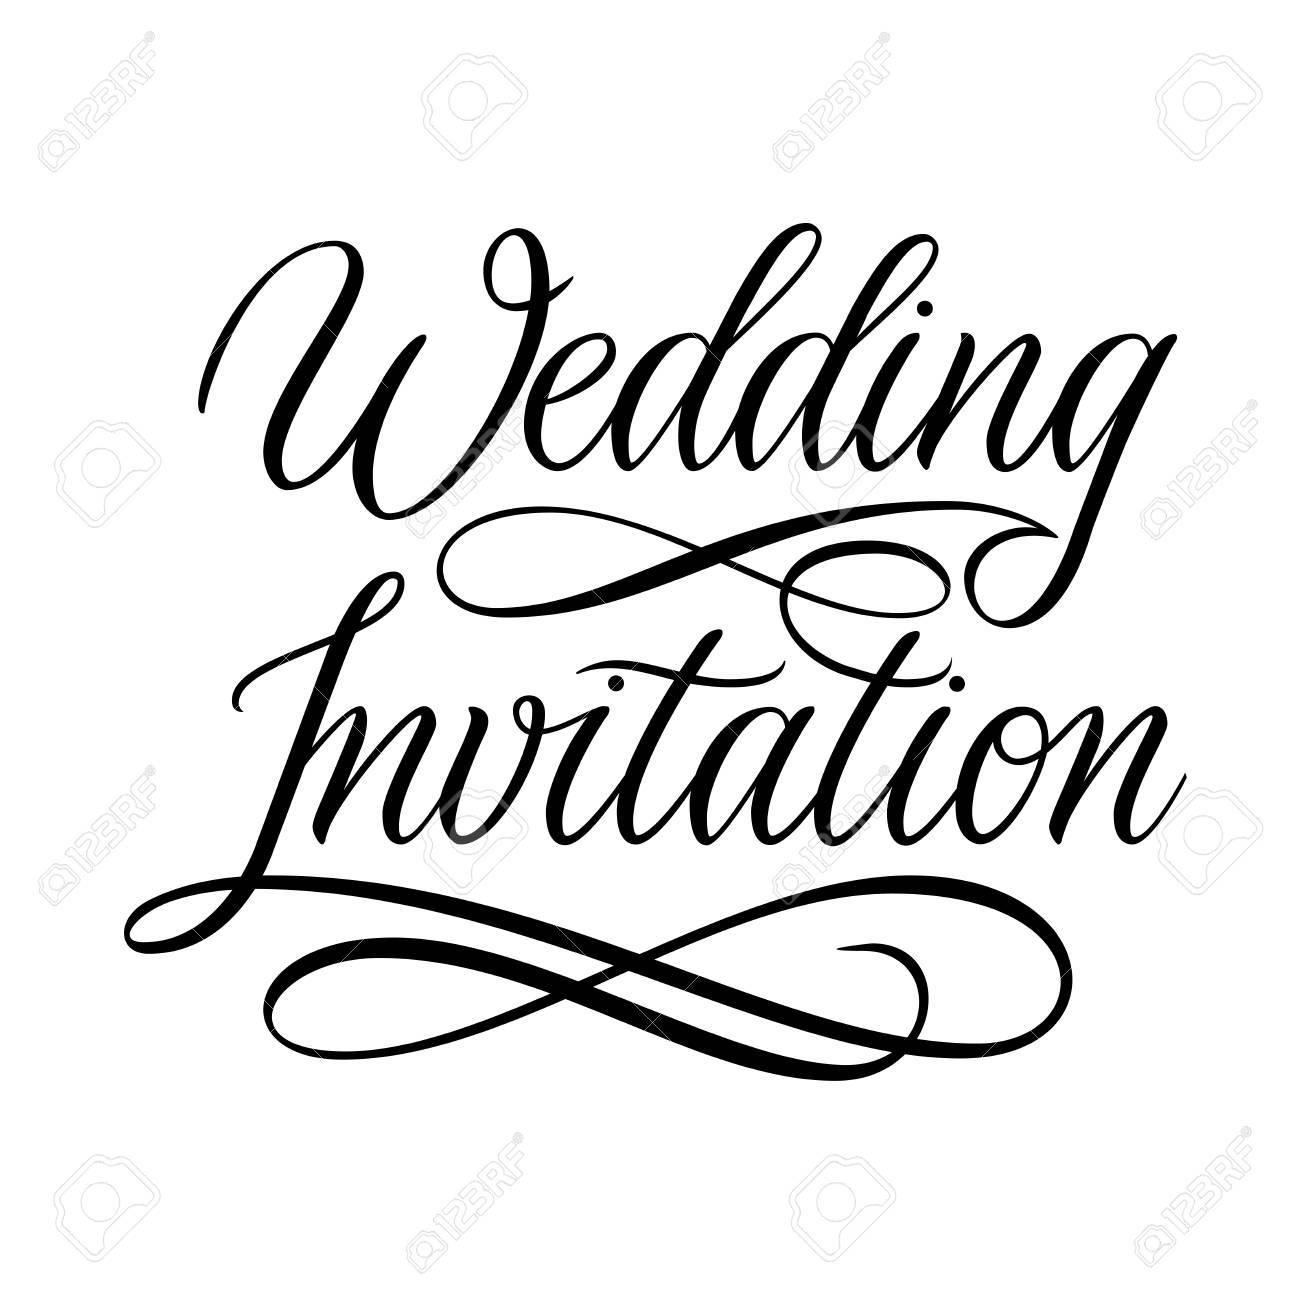 Wedding Invitation card design. Hand Written calligraphy flourish...